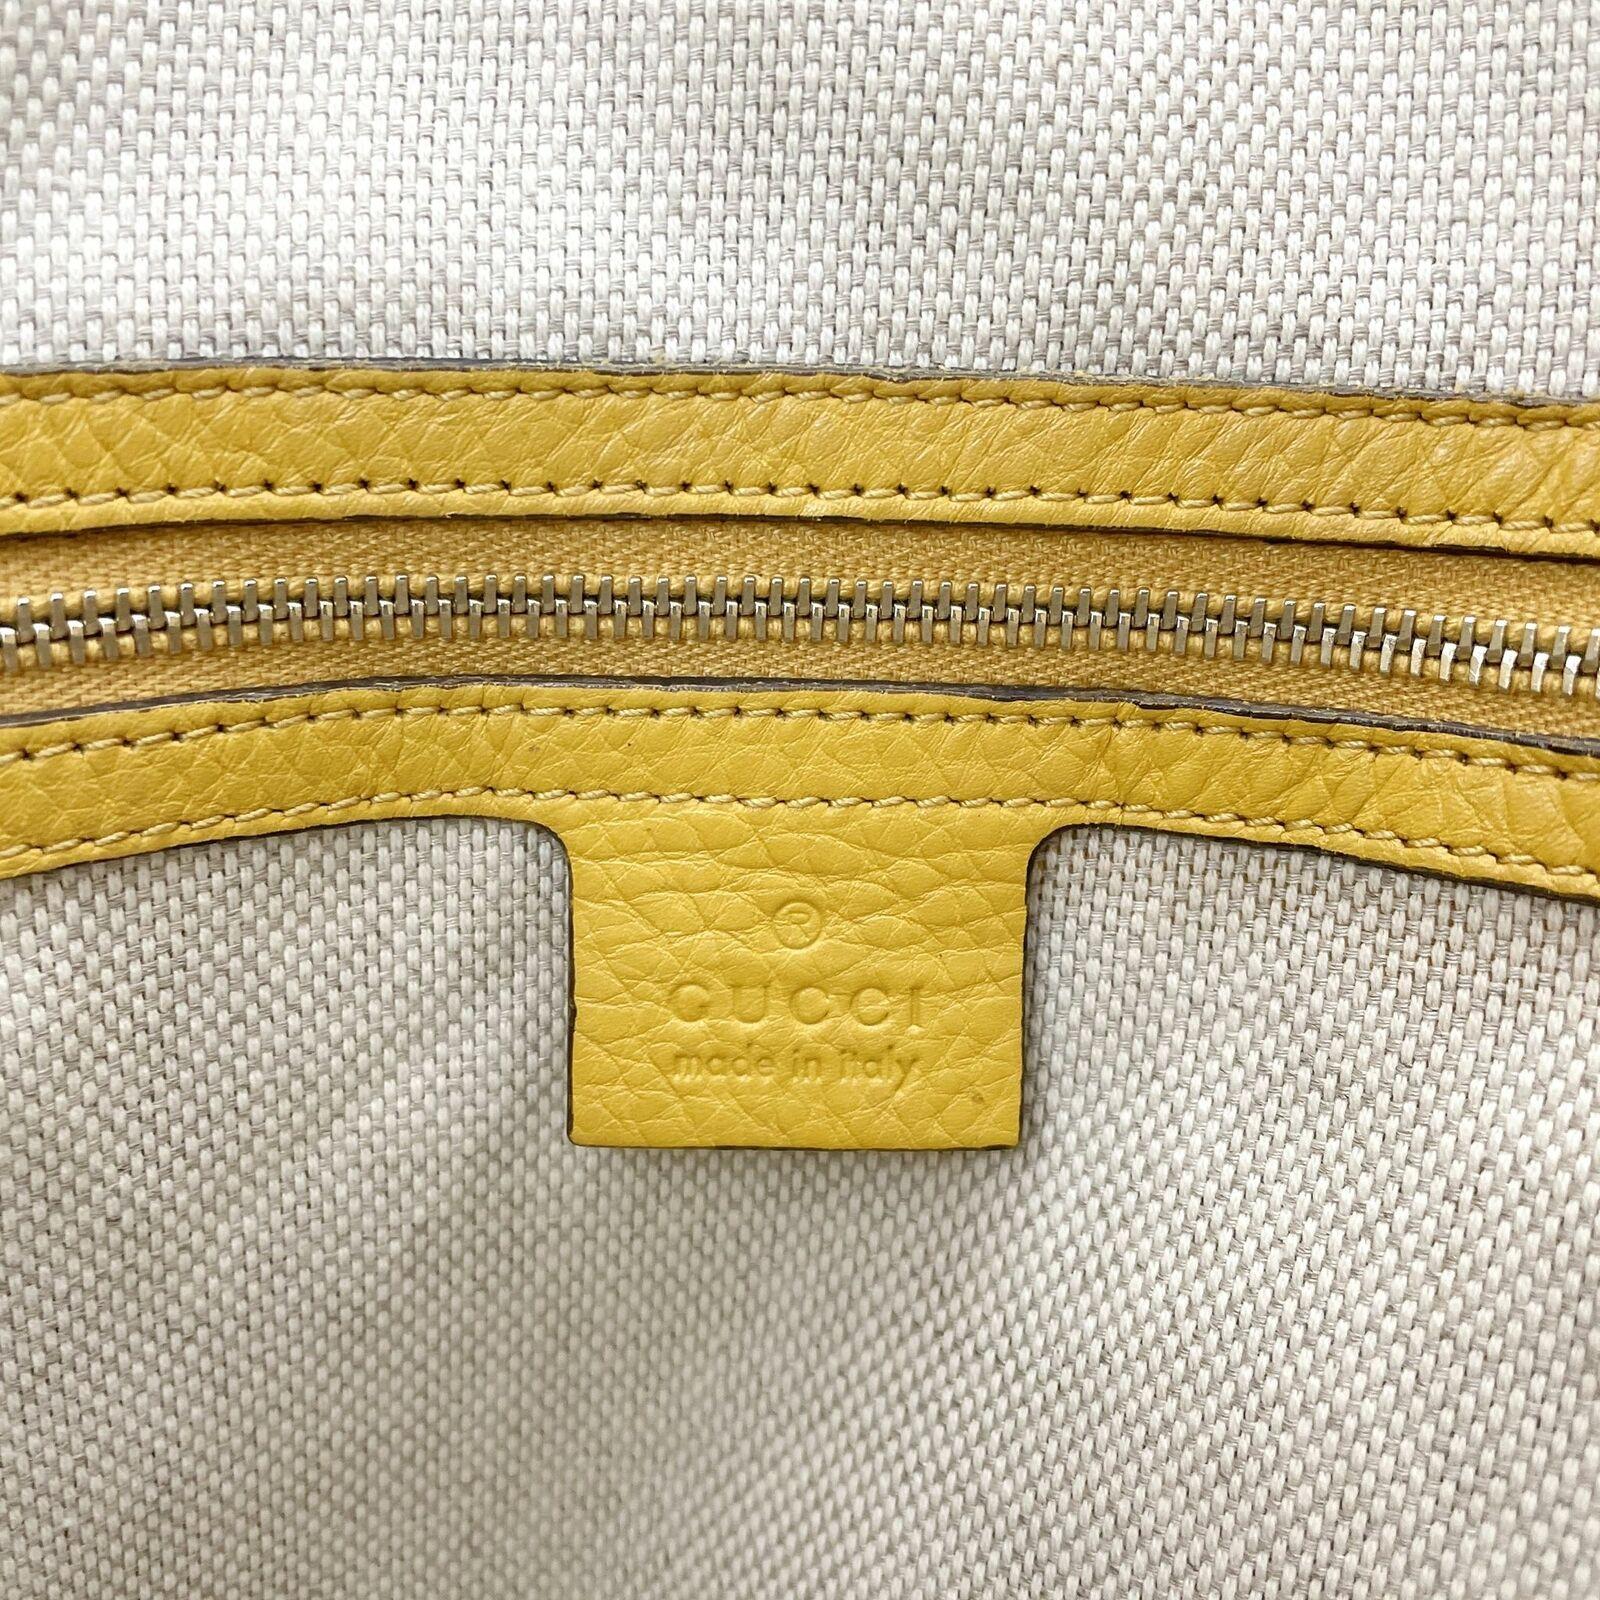 Gucci GG Canvas Diana Bamboo Shoulder Bag - Beige… - image 11